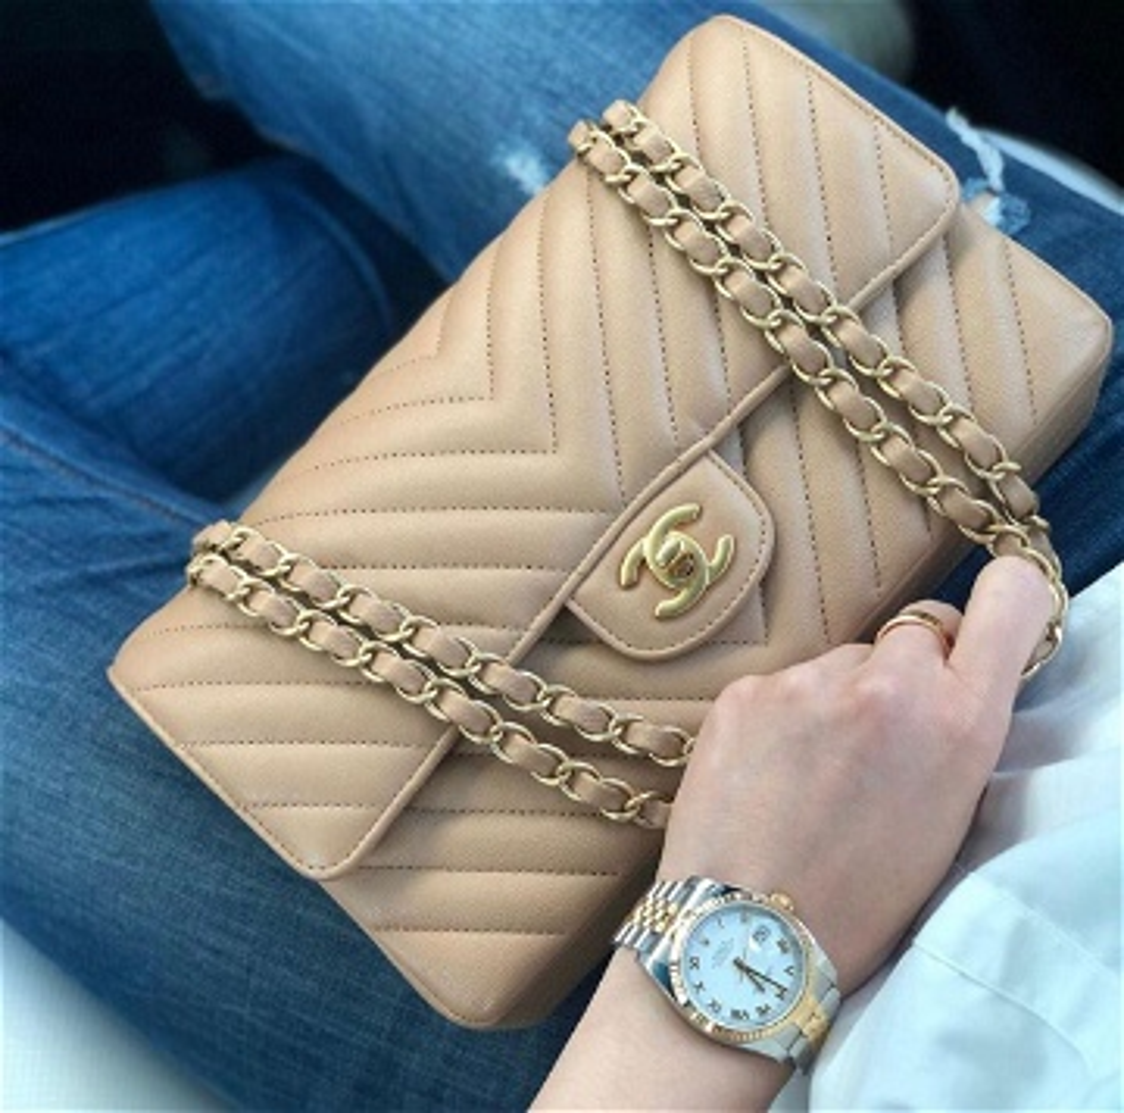 Classic Handbag chanel